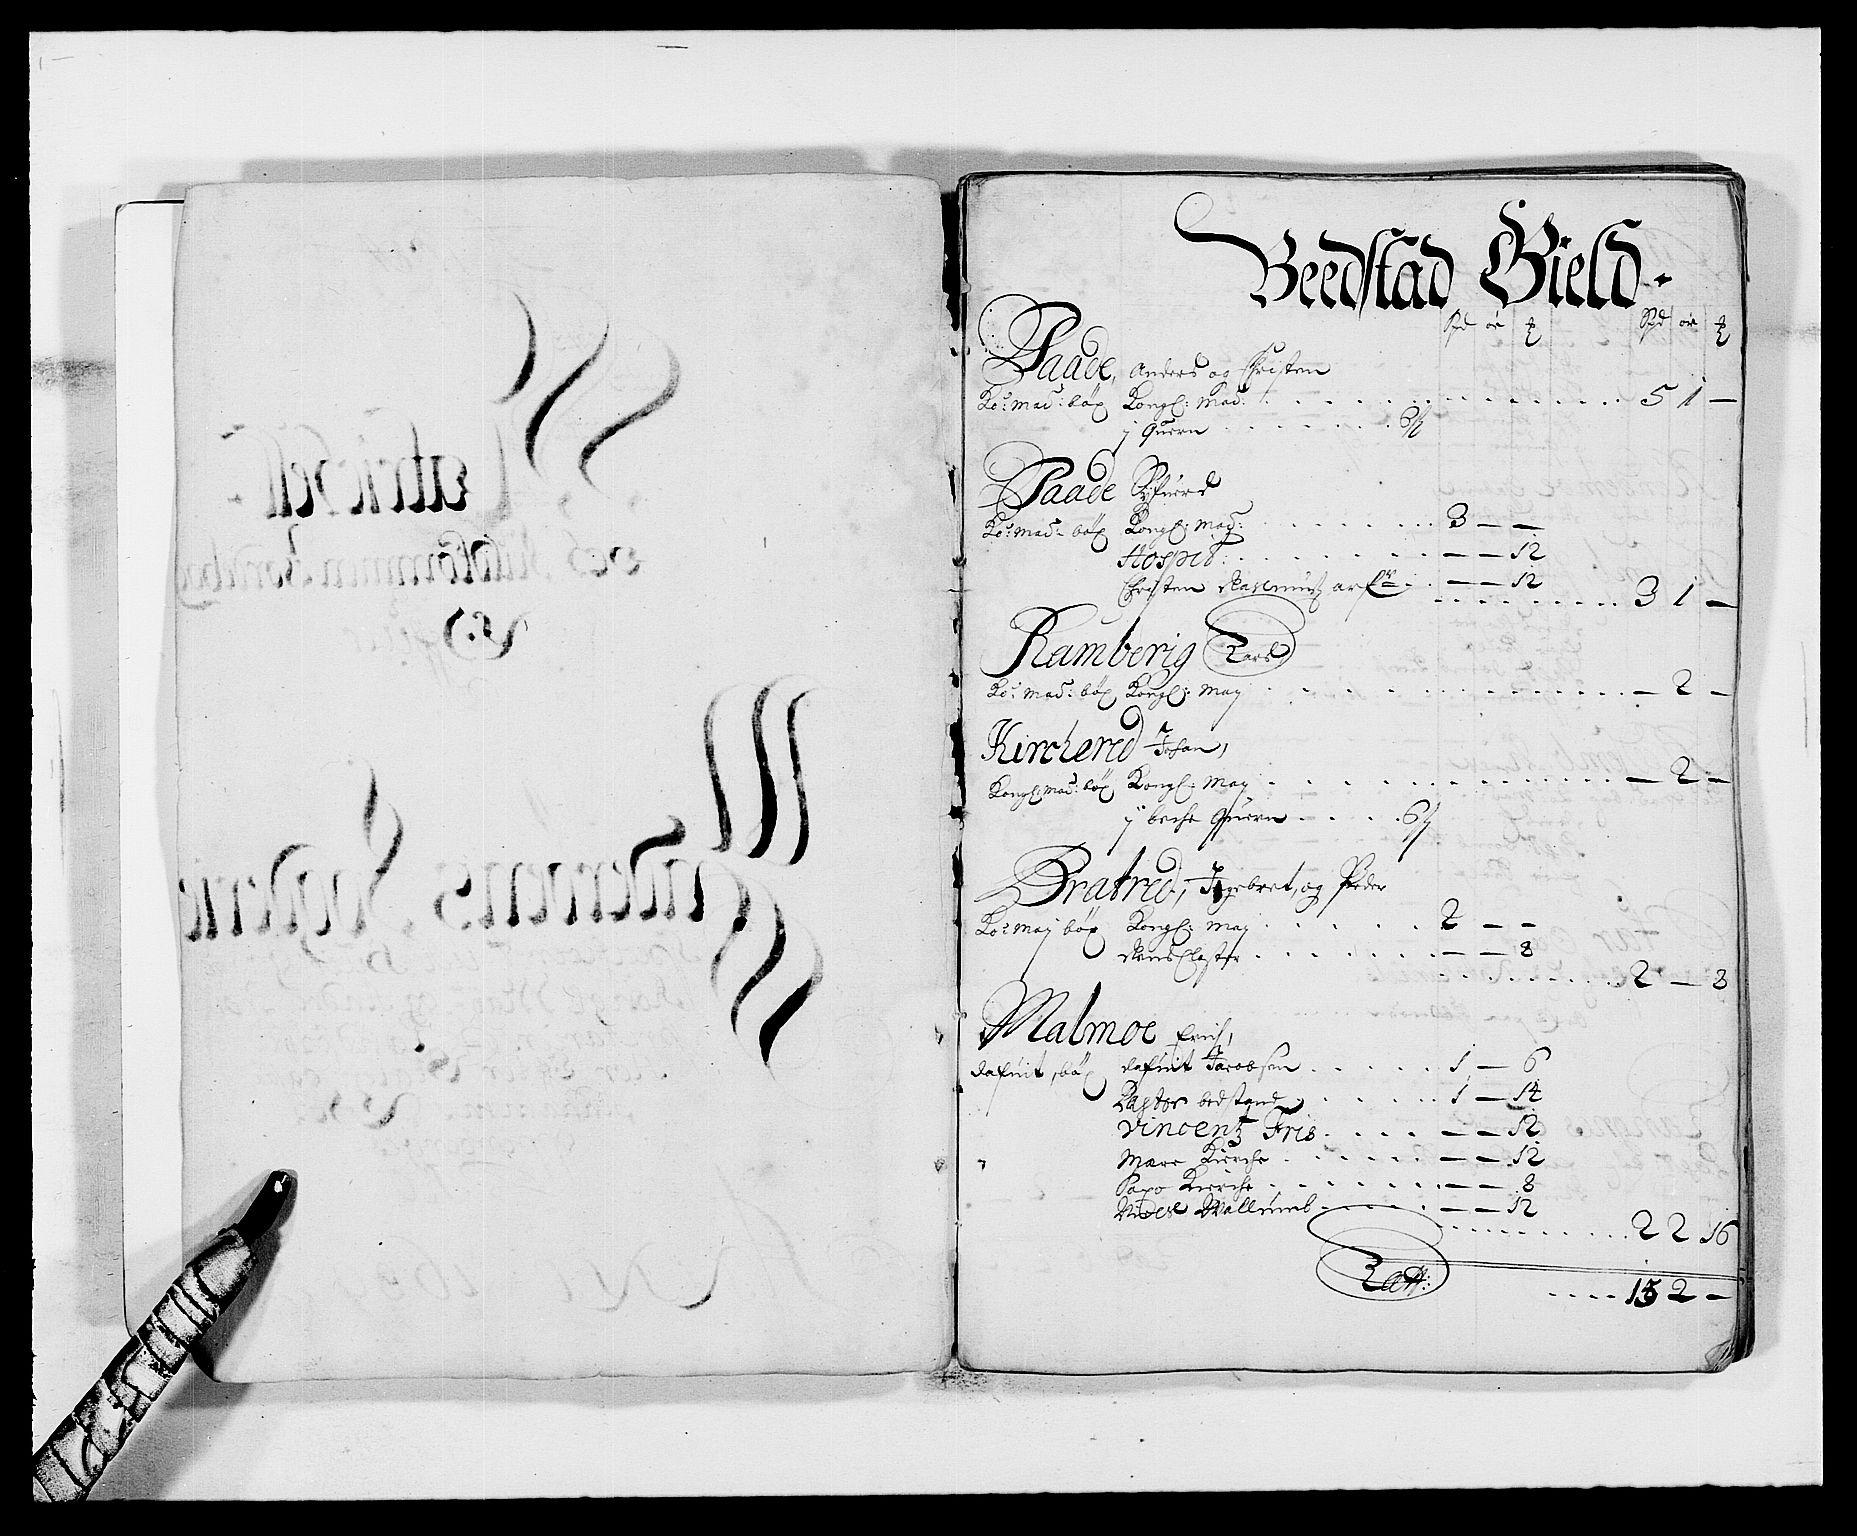 RA, Rentekammeret inntil 1814, Reviderte regnskaper, Fogderegnskap, R63/L4307: Fogderegnskap Inderøy, 1690-1691, s. 10